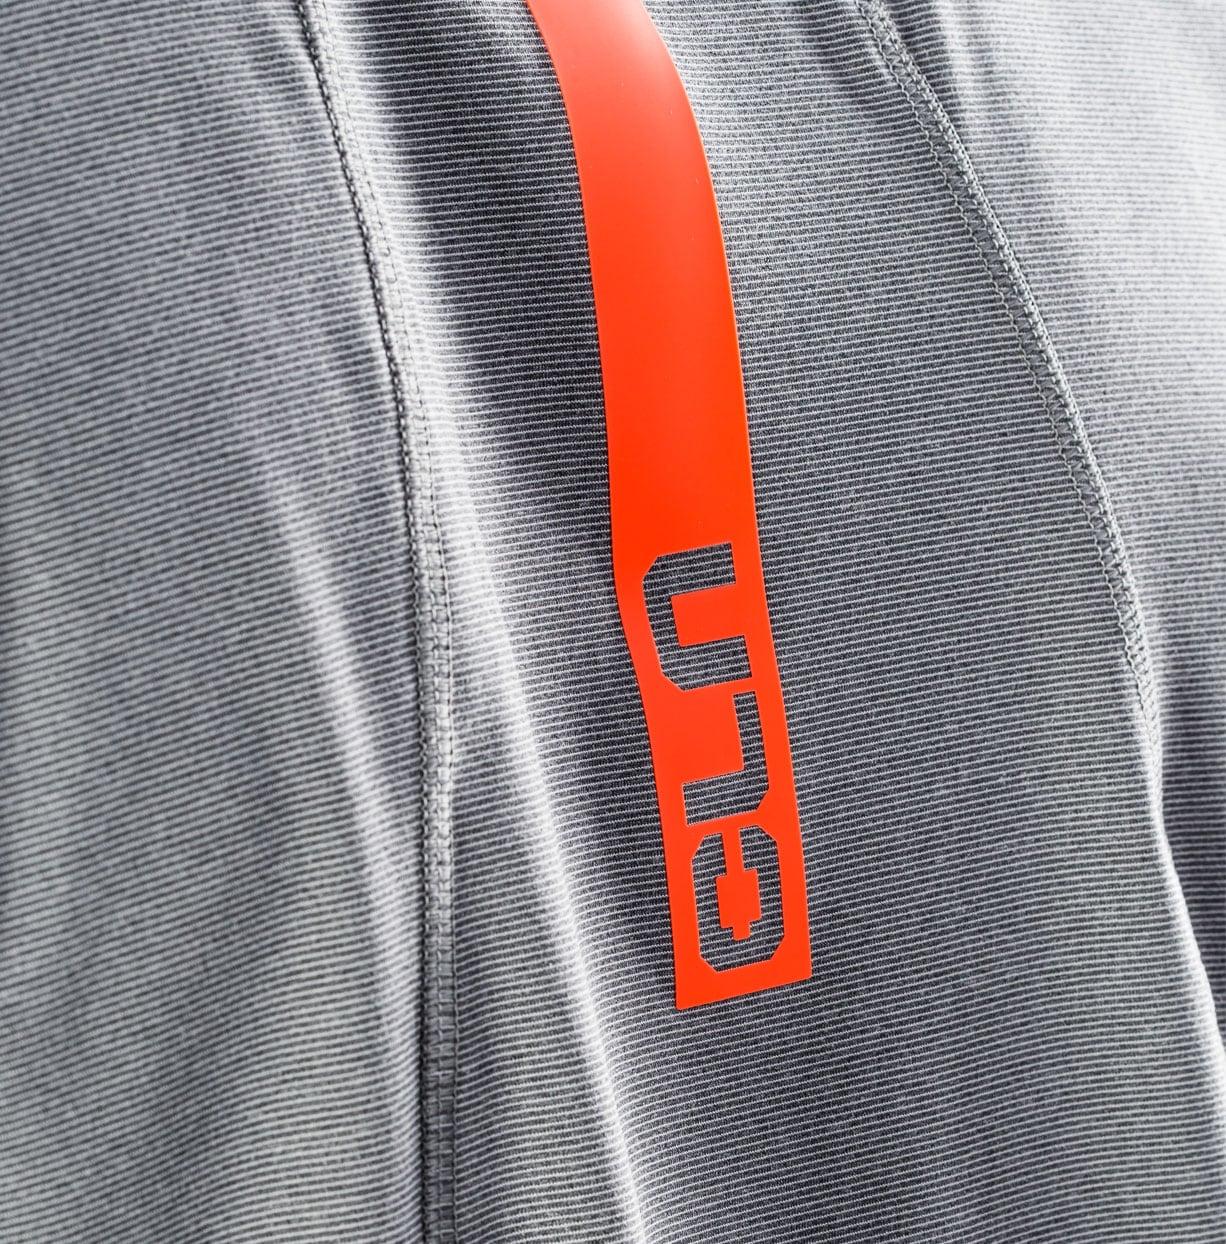 cln-ultra-longslevve-tee-grey-detail1